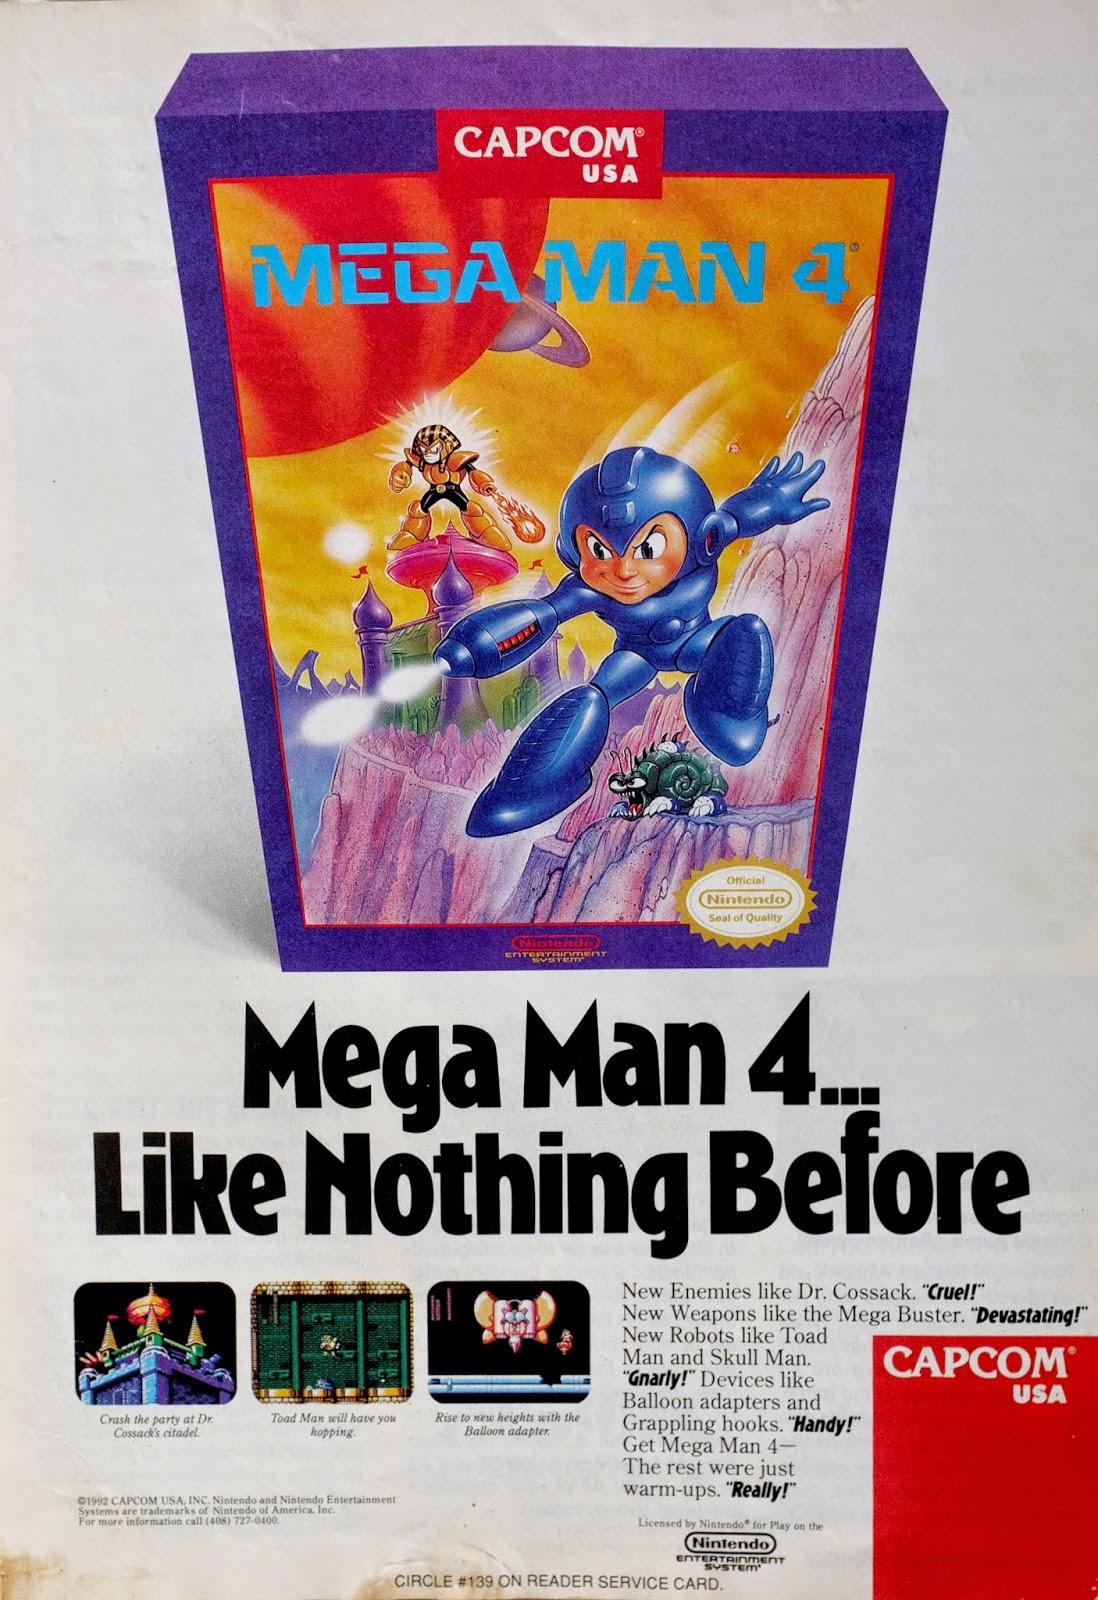 Mega Man 4 for NES advertisement